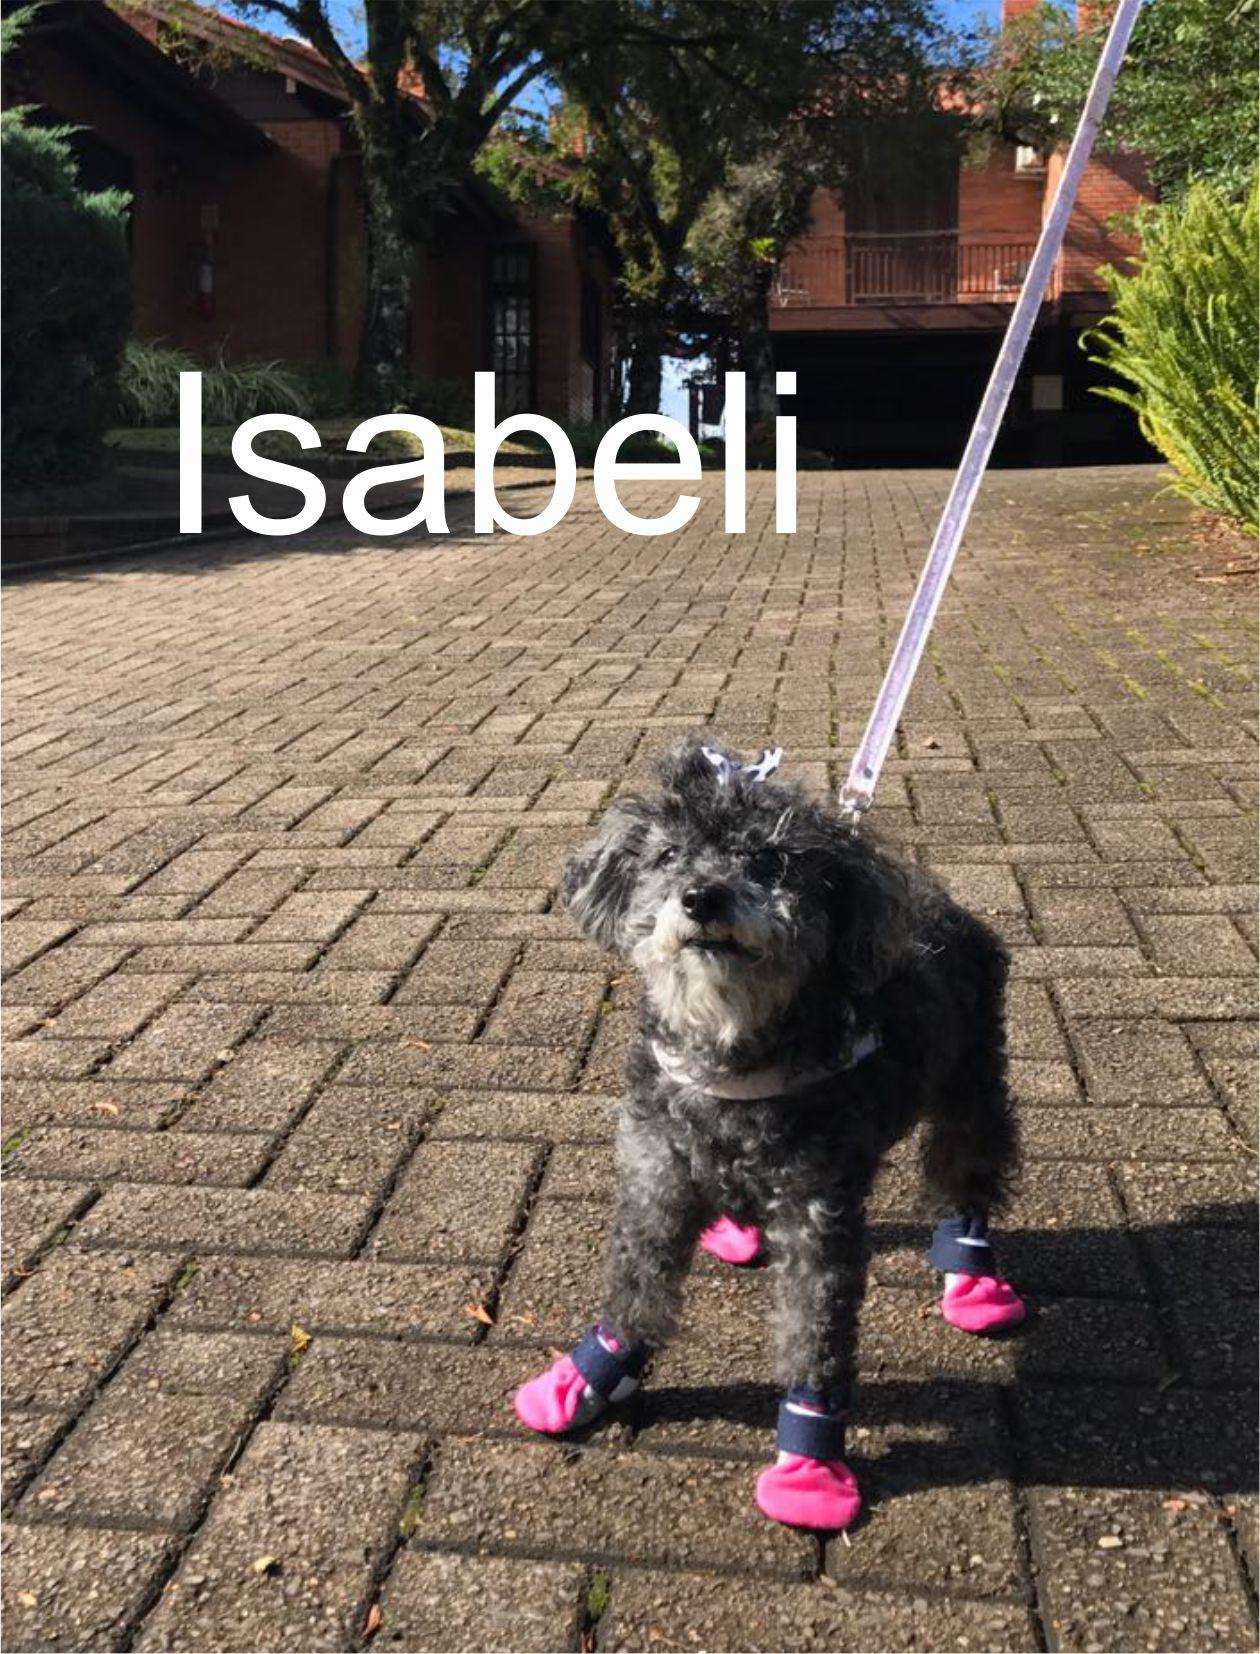 IMG-20170505-WA0005 - Isabeli